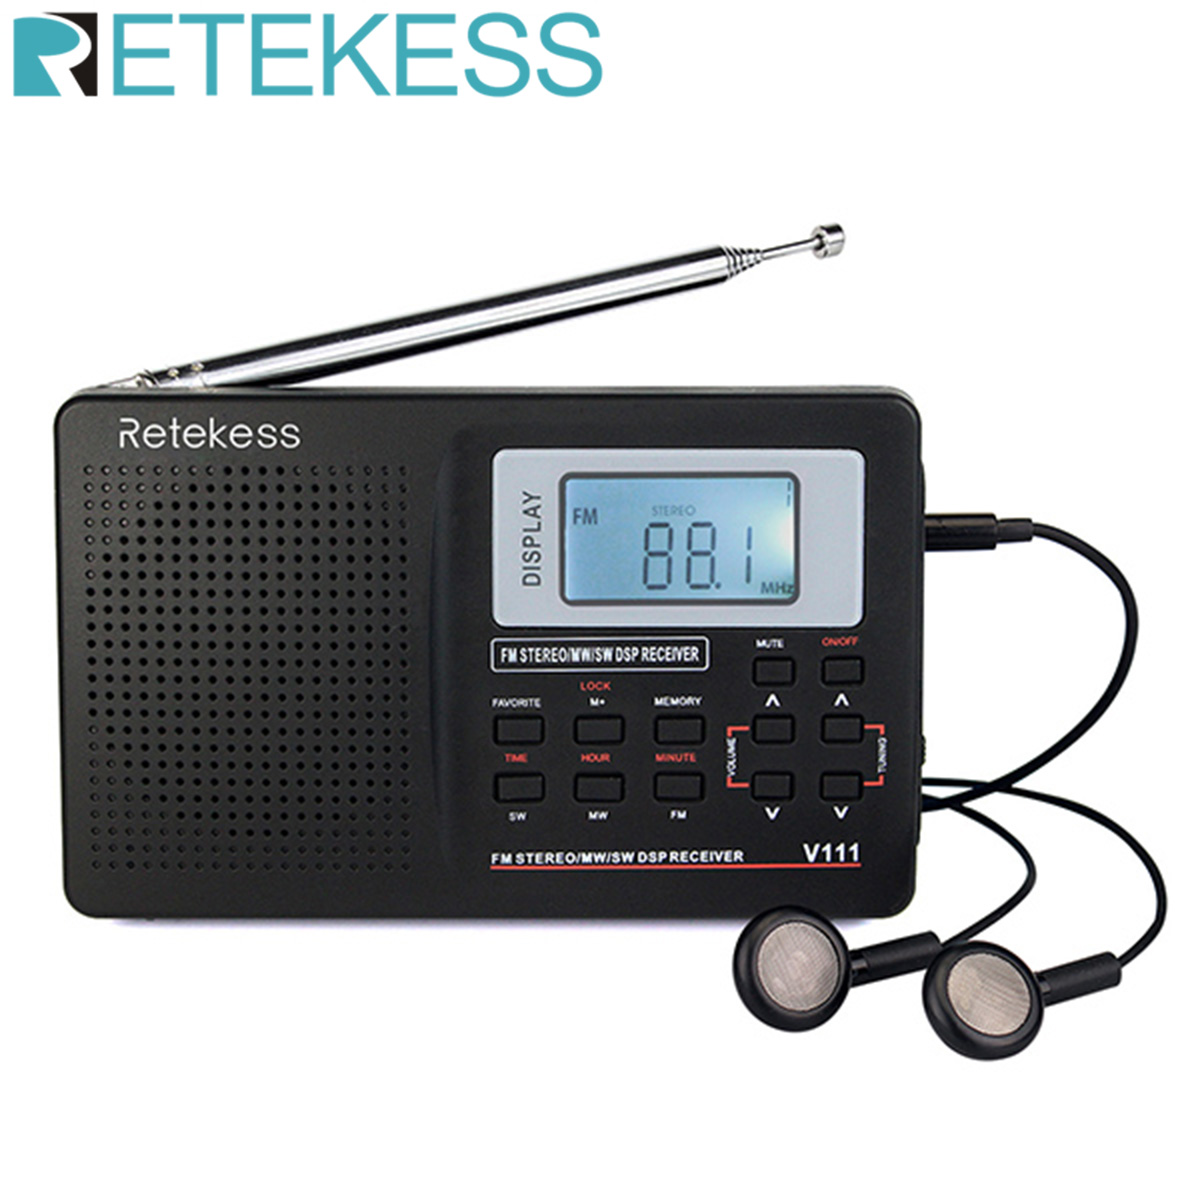 Retekess V111 Radio FM Stereo/ MW / SW Radio Station Full Band Radio Receiver Portable Clock & Alarm